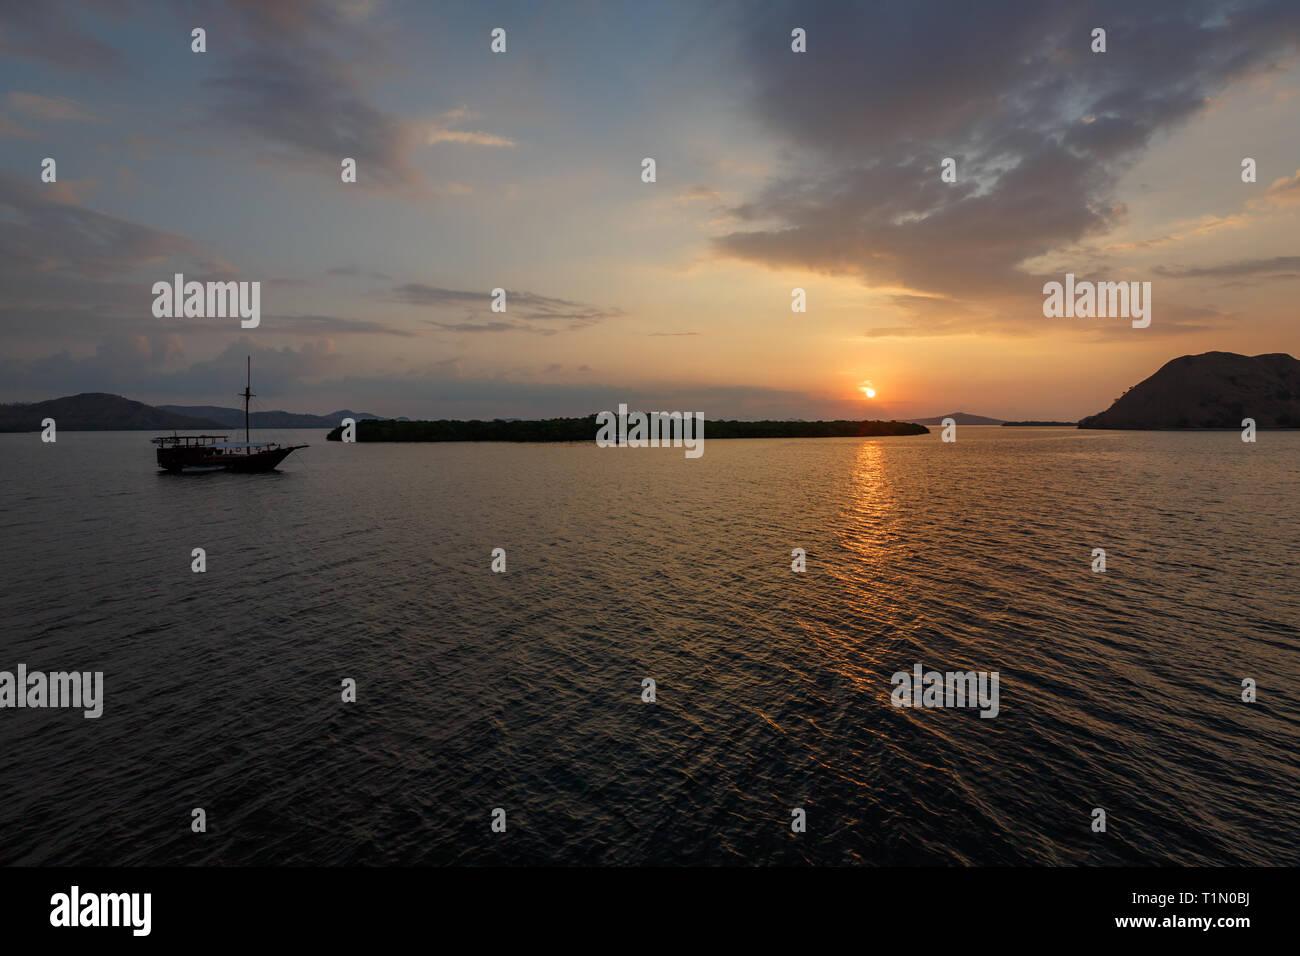 passengers on ferry goinging to Komodo Isalnd enjoy beautiful sunset on water - Stock Image